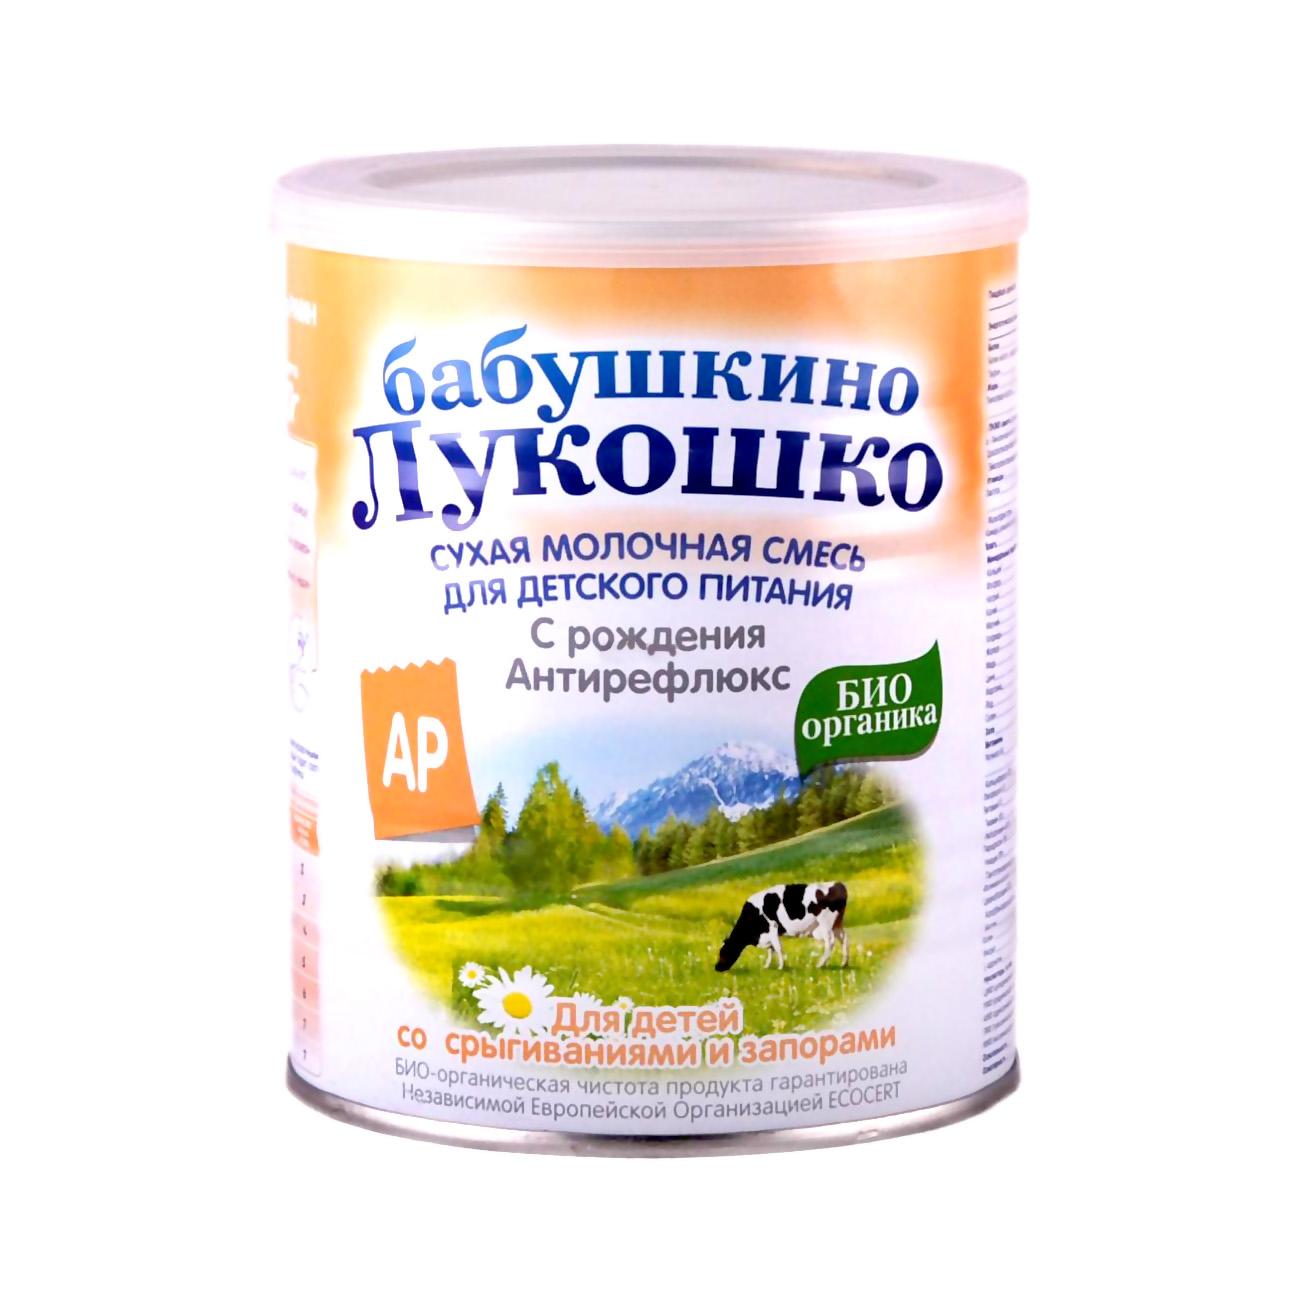 Заменитель Бабушкино лукошко Антирефлюкс БИО 400 гр с 0 мес